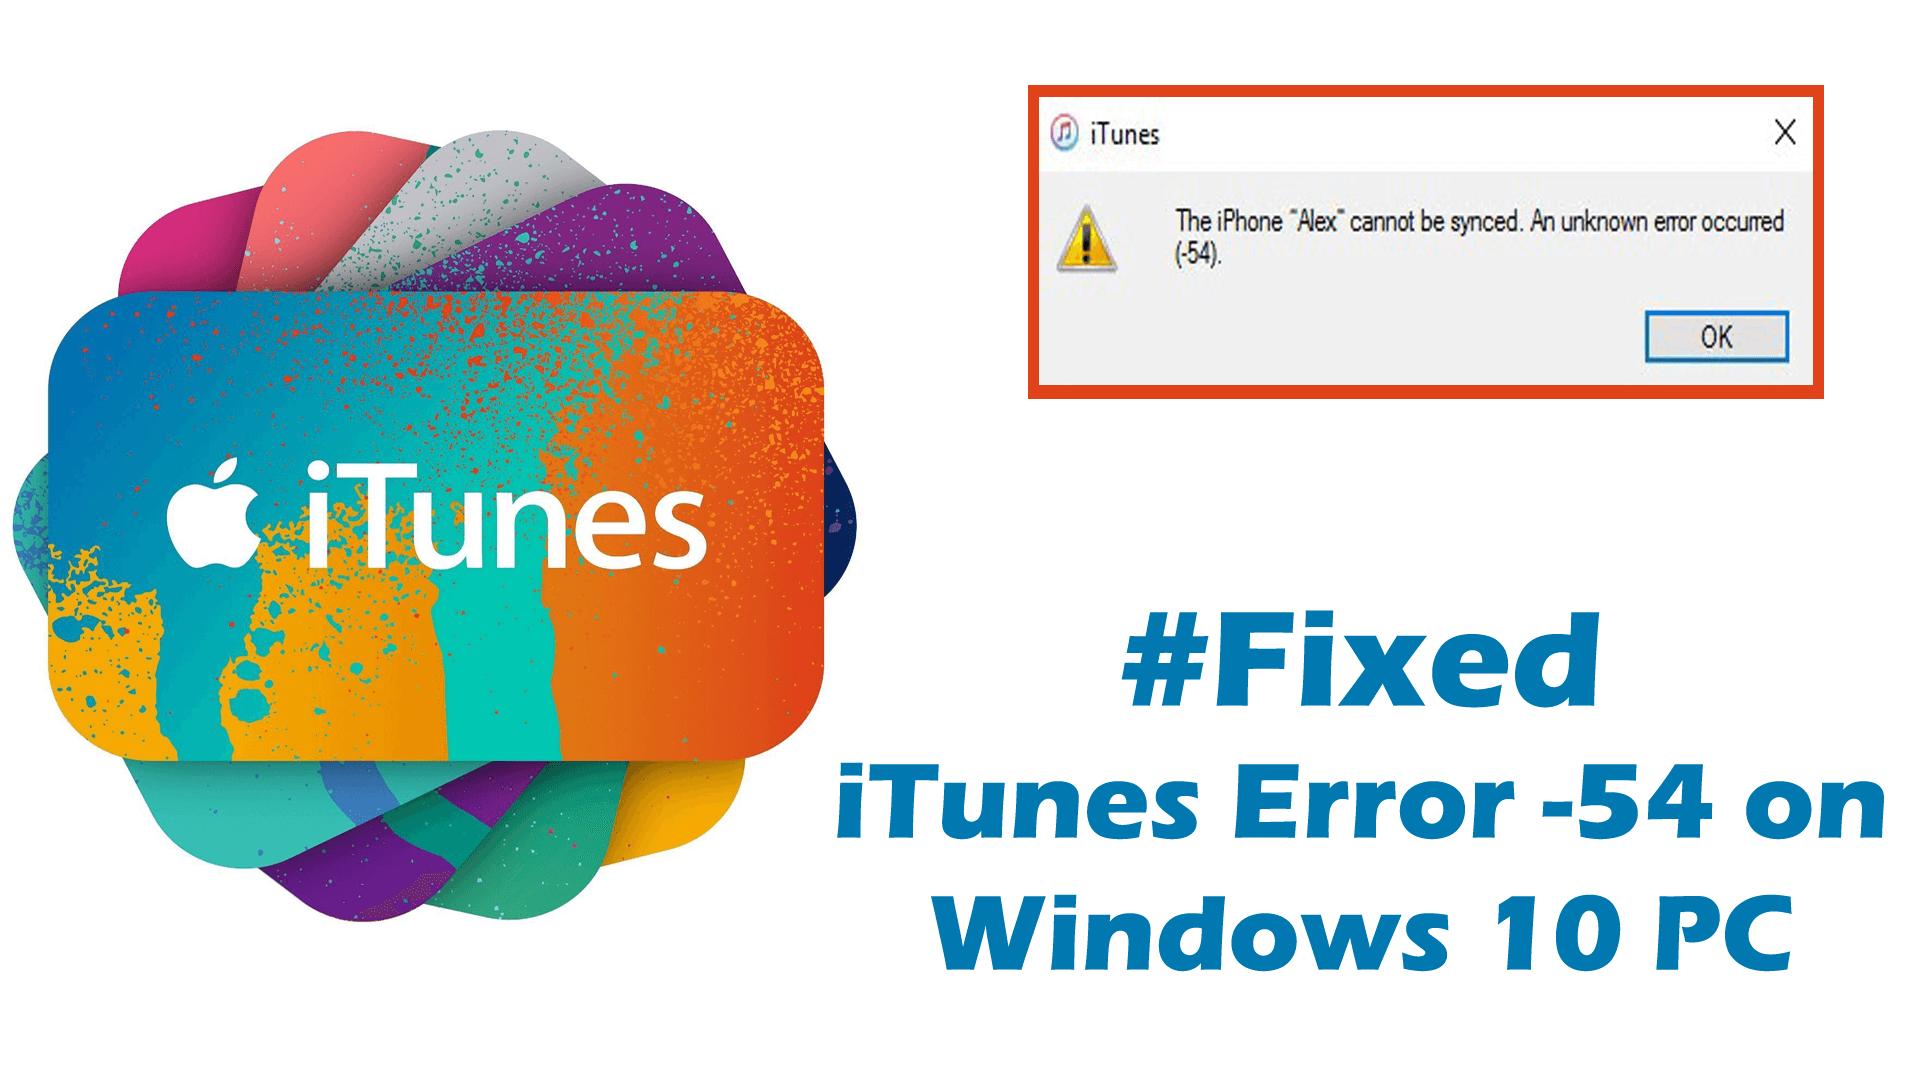 fix iTunes Error -54 on Windows 10 PC